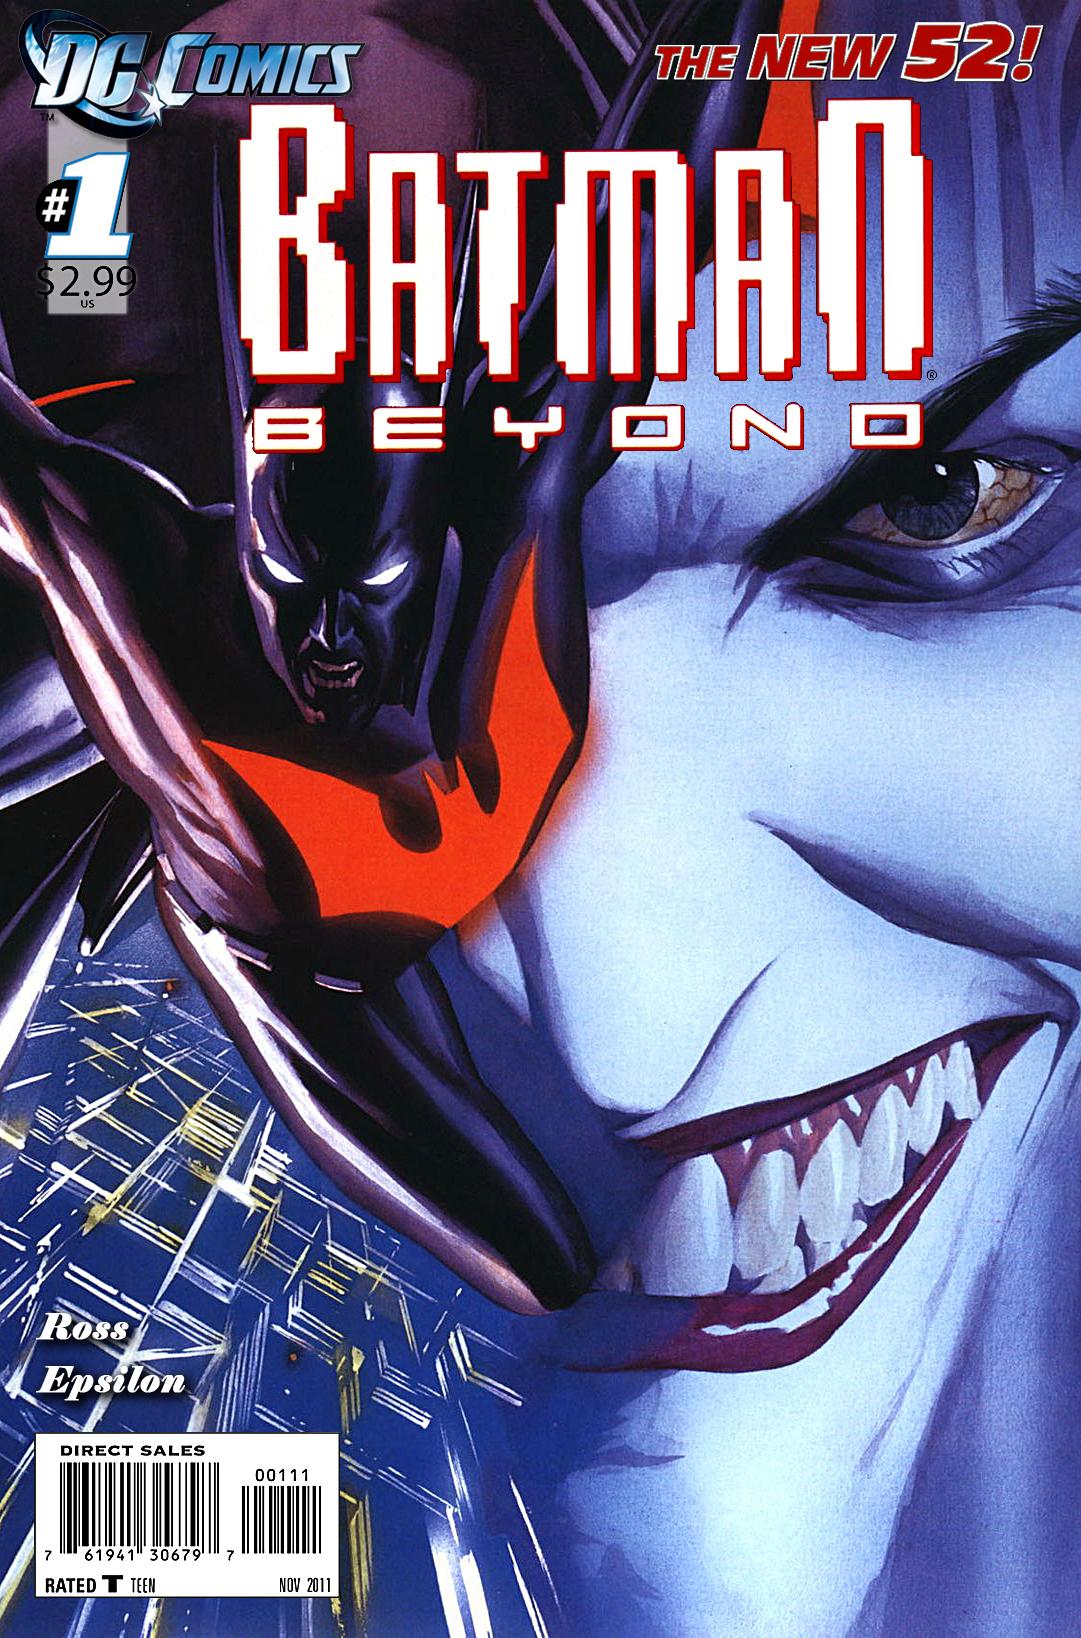 Batman Beyond New 52 No. 1 by EpsilonTLOSdark4 on DeviantArtNew 52 Batman Beyond